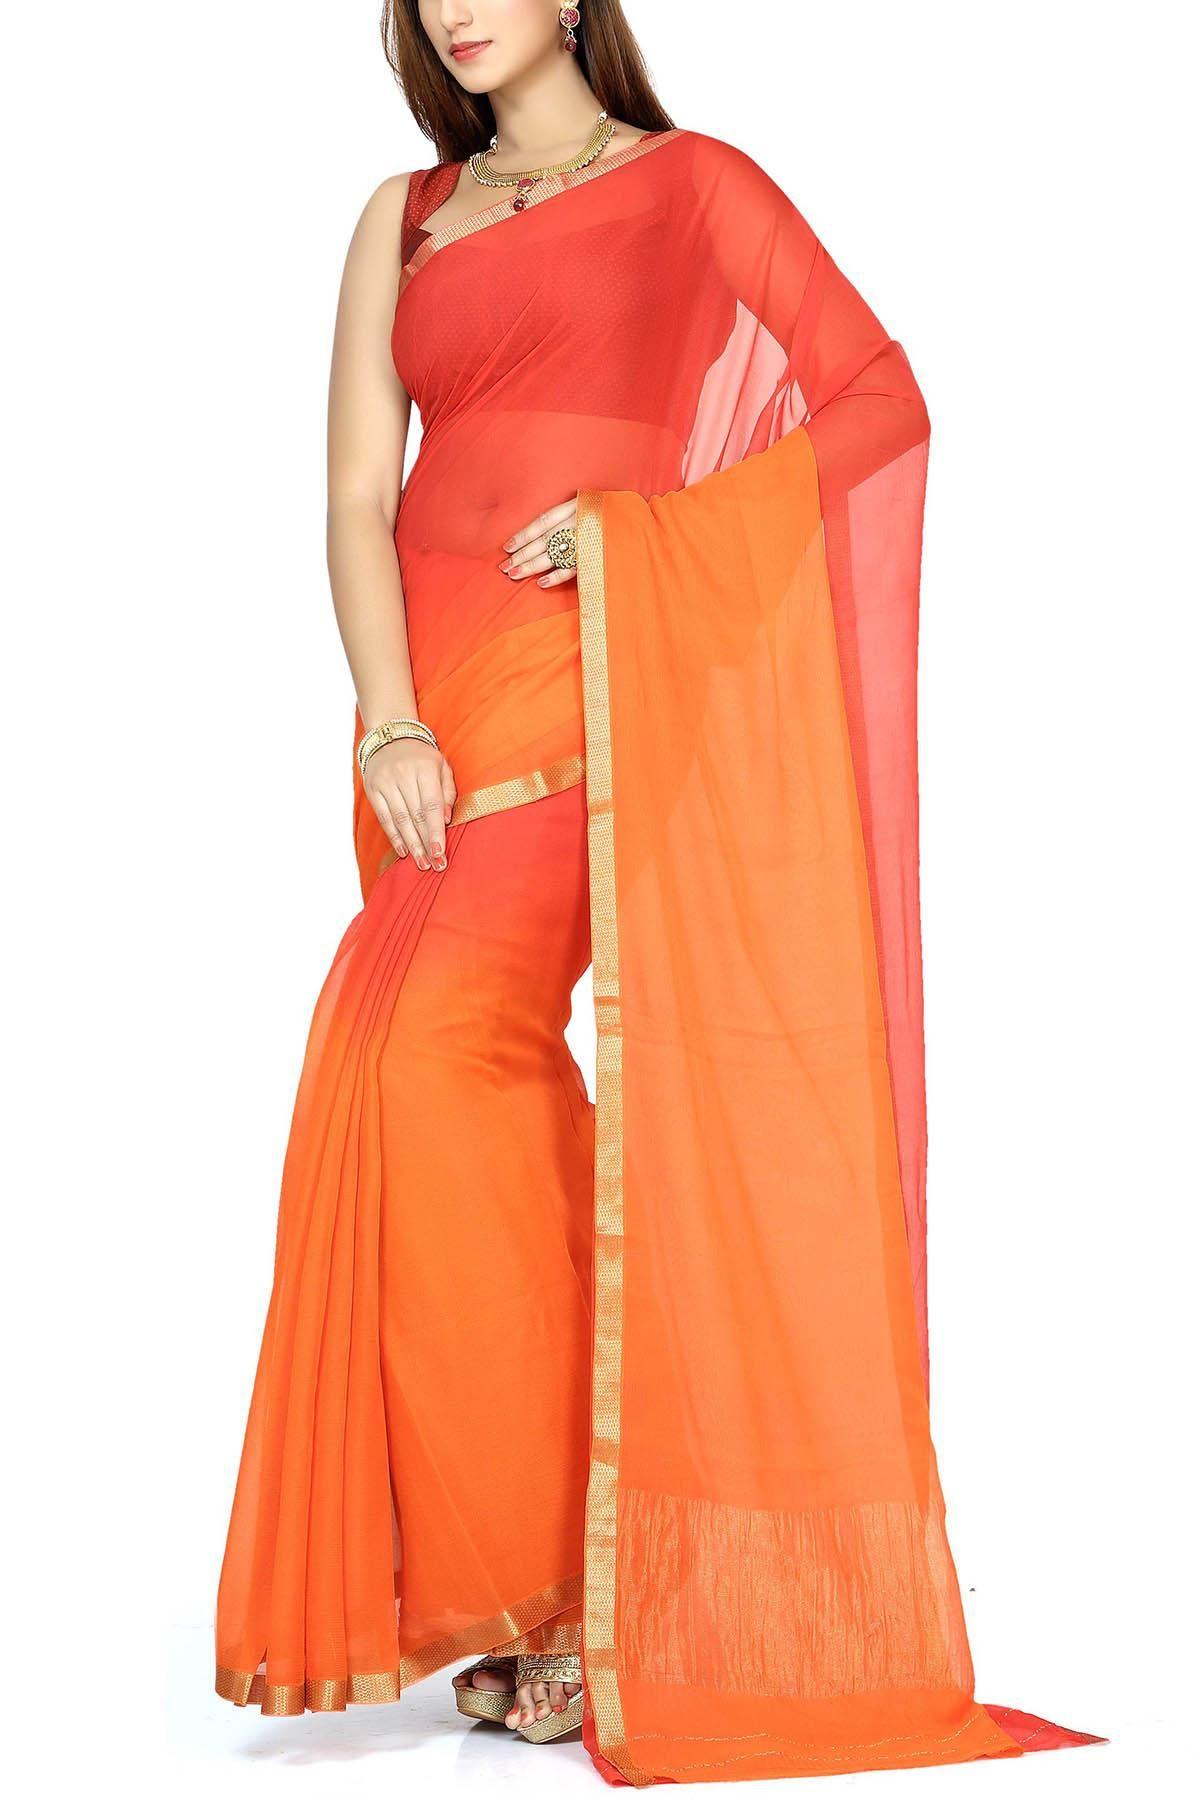 23ed5d6396 Scarlet & Bright Orange Shaded Pure Chiffon Zari Border Saree ...